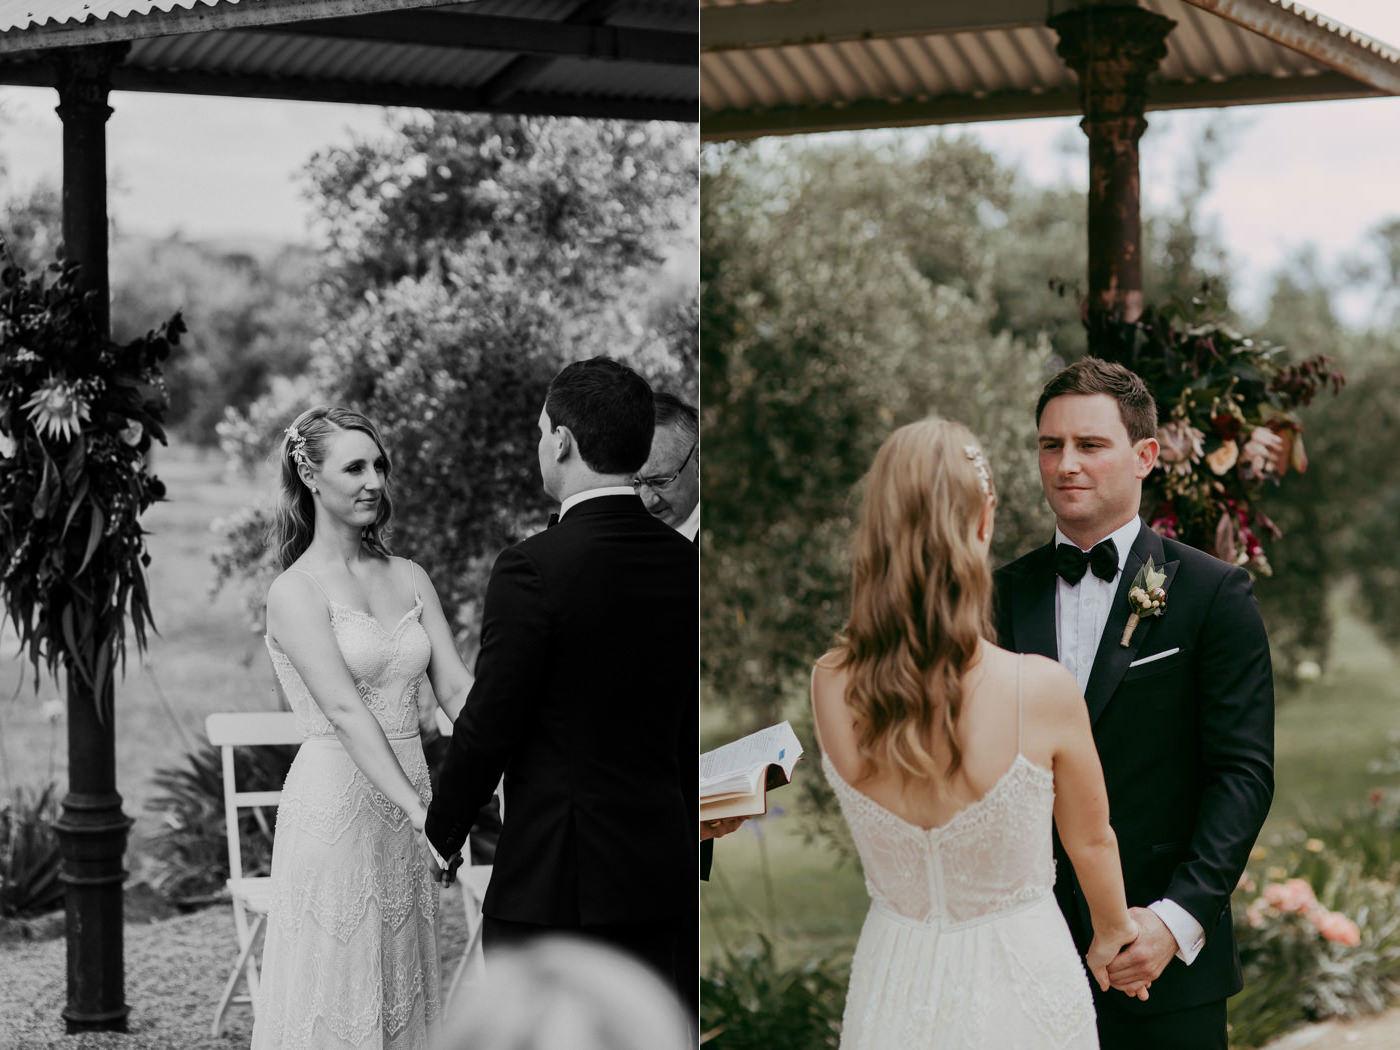 Anthony & Eliet - Wagga Wagga Wedding - Country NSW - Samantha Heather Photography-103.jpg